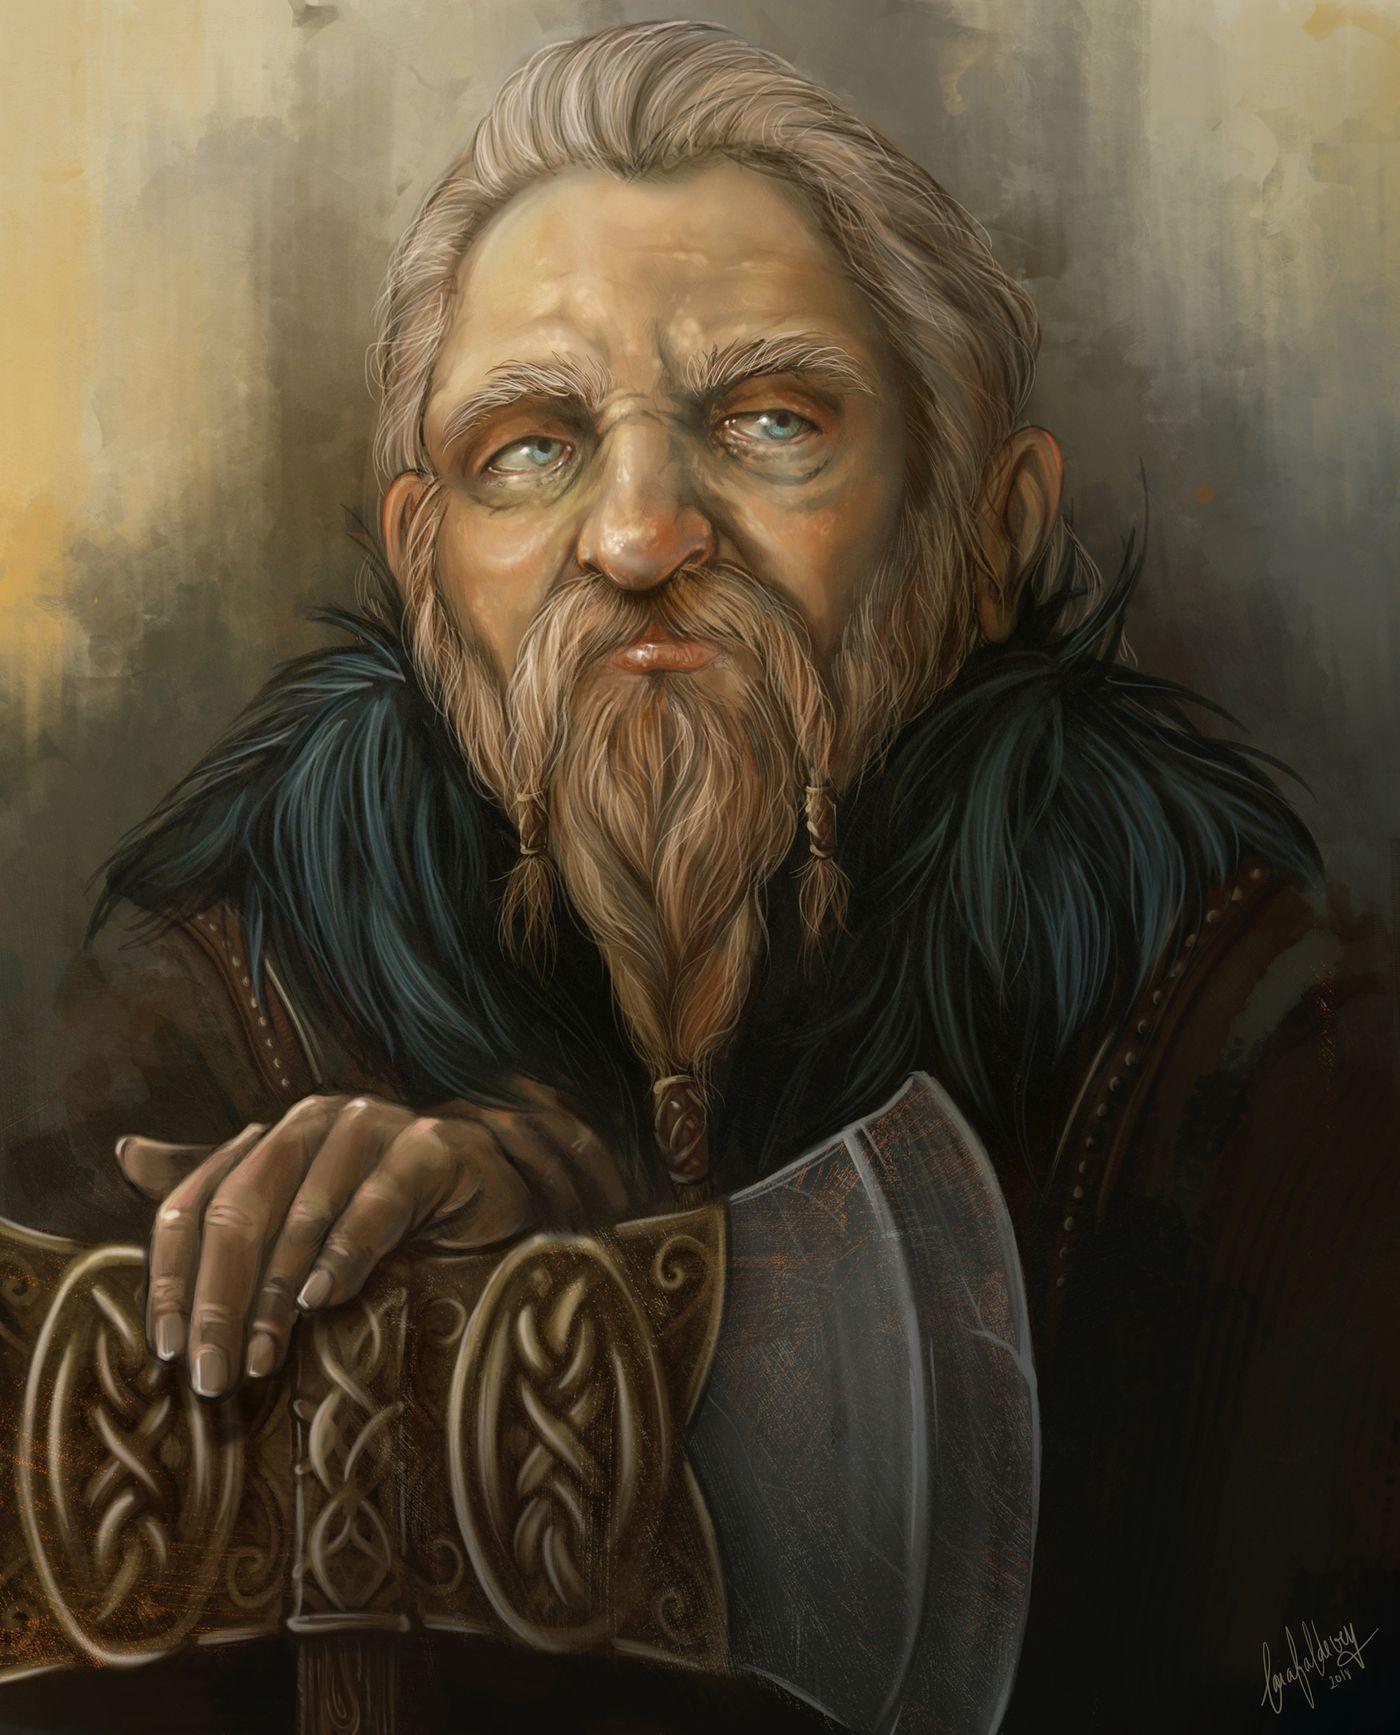 Viking2 Laiabaldevey